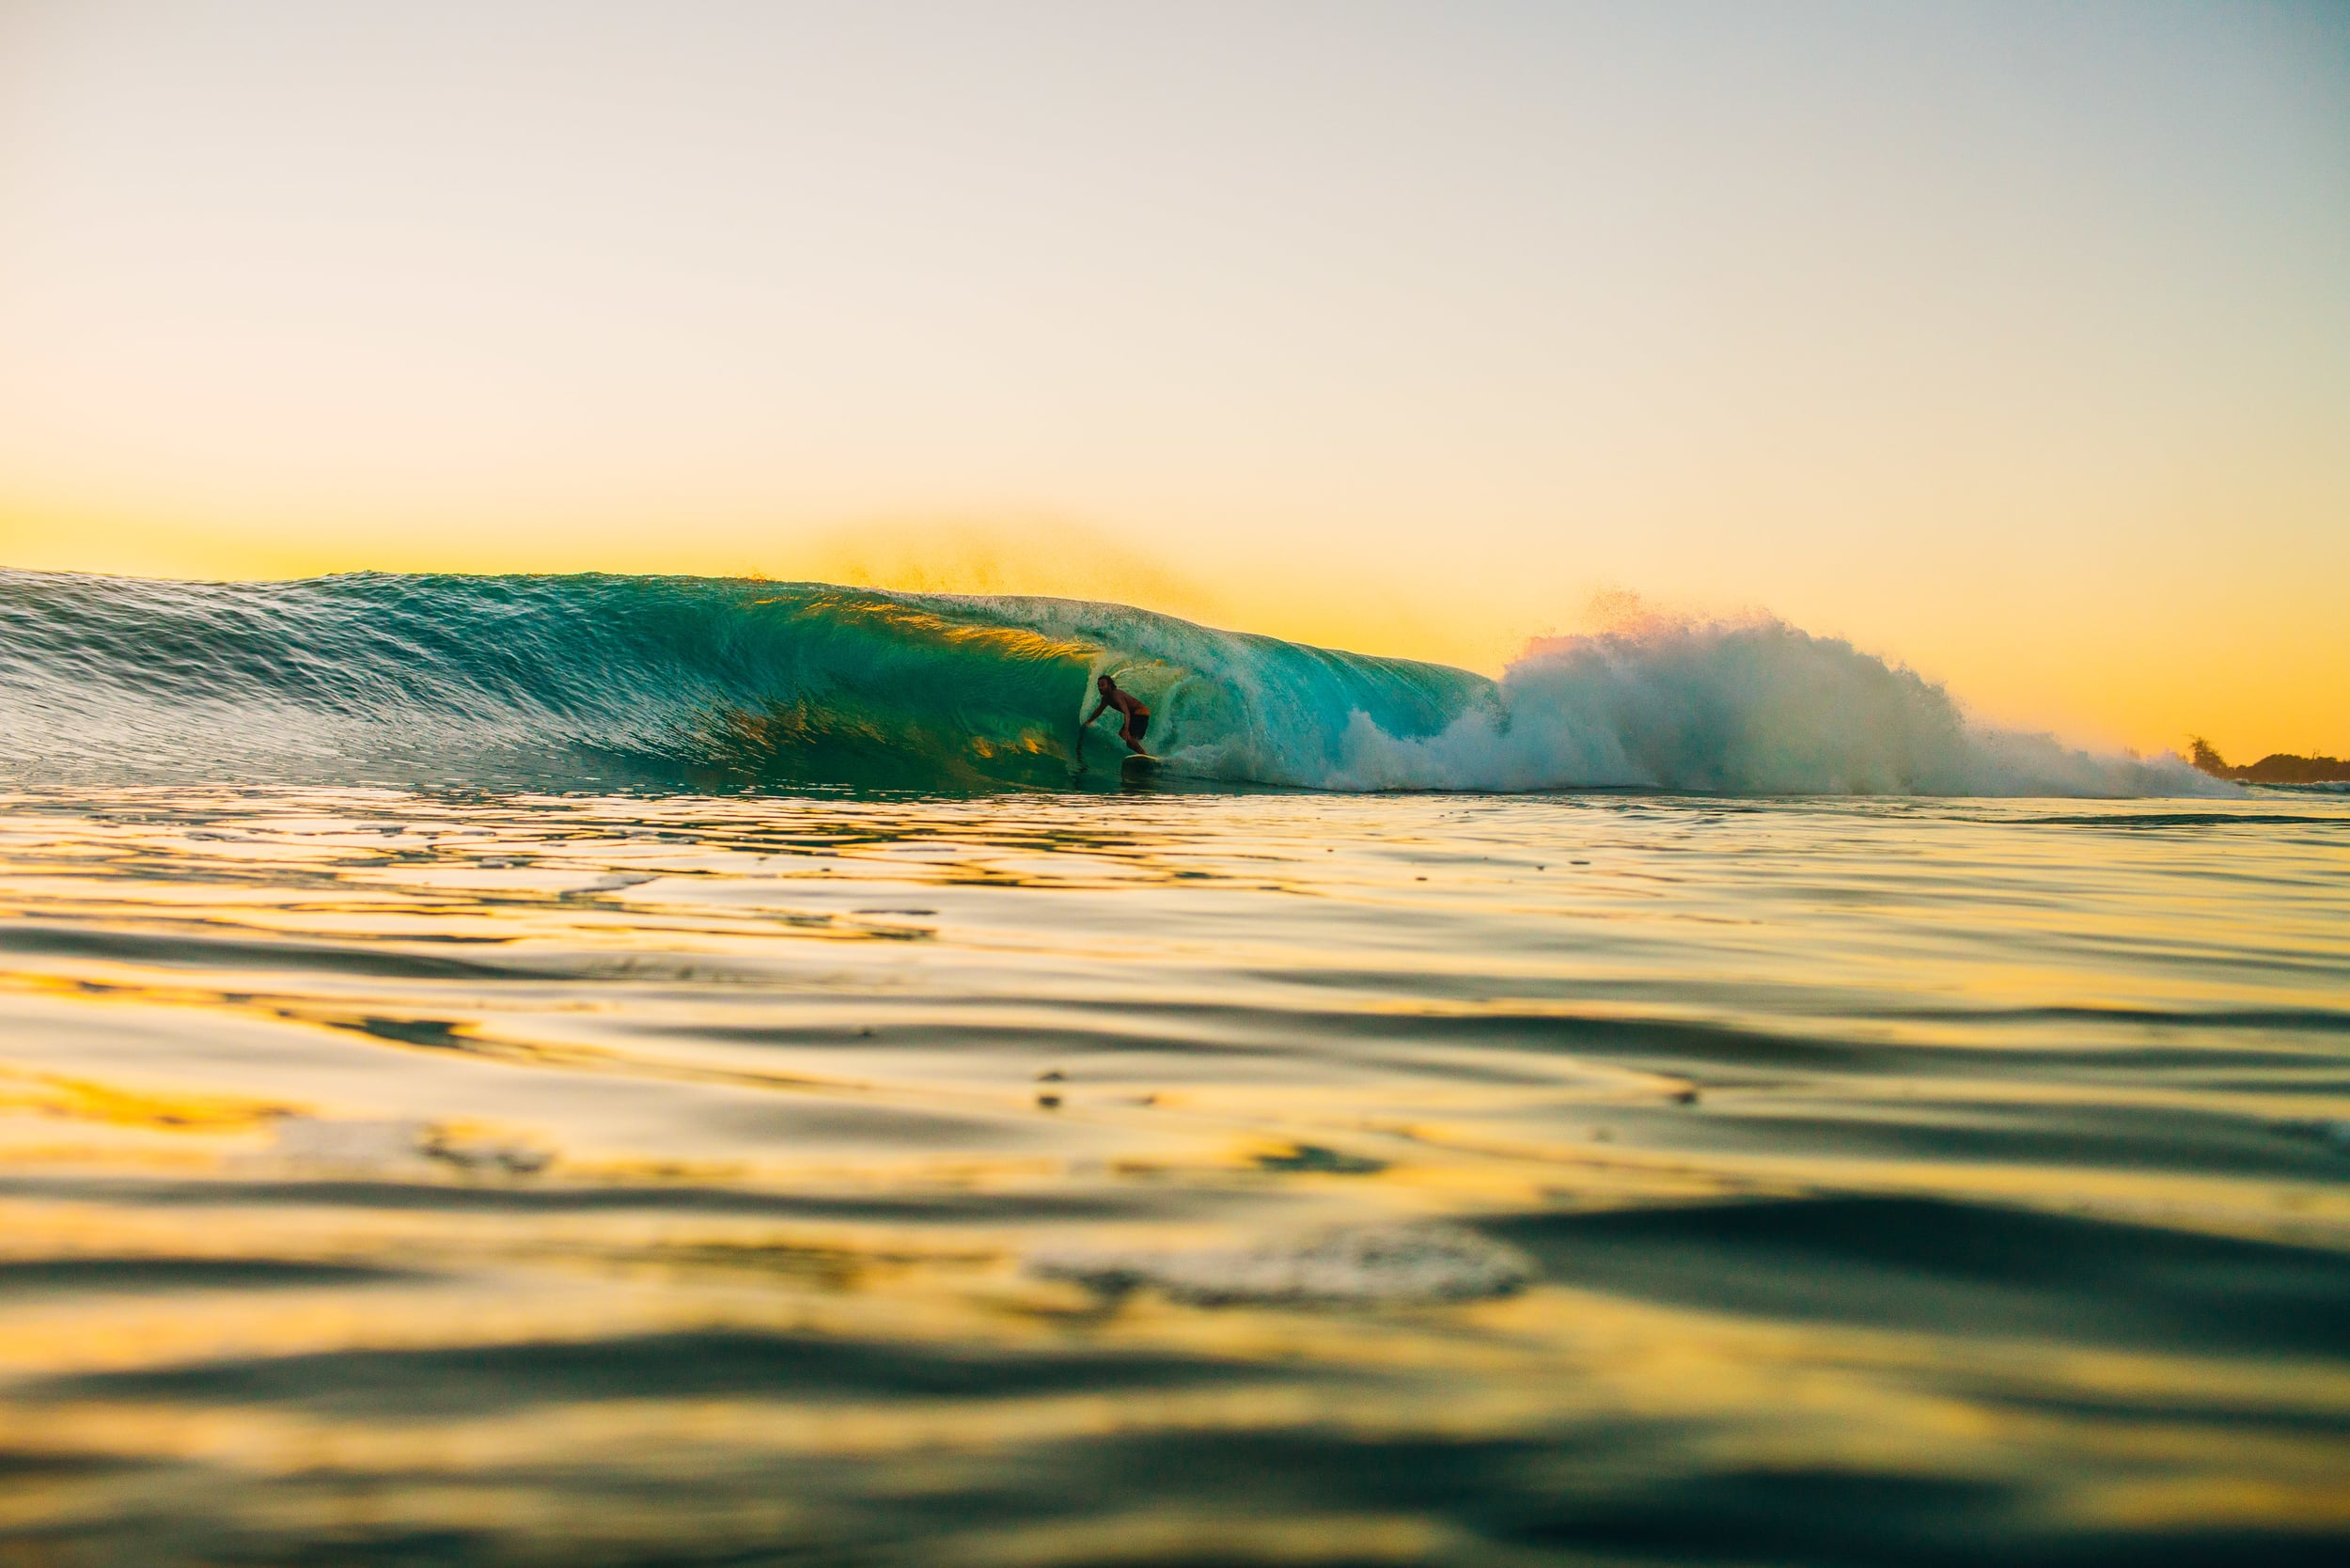 bryce-johnson-photography-kauai-hawaii-surfing-a7rii-aquatech-water-ocean-10.jpg